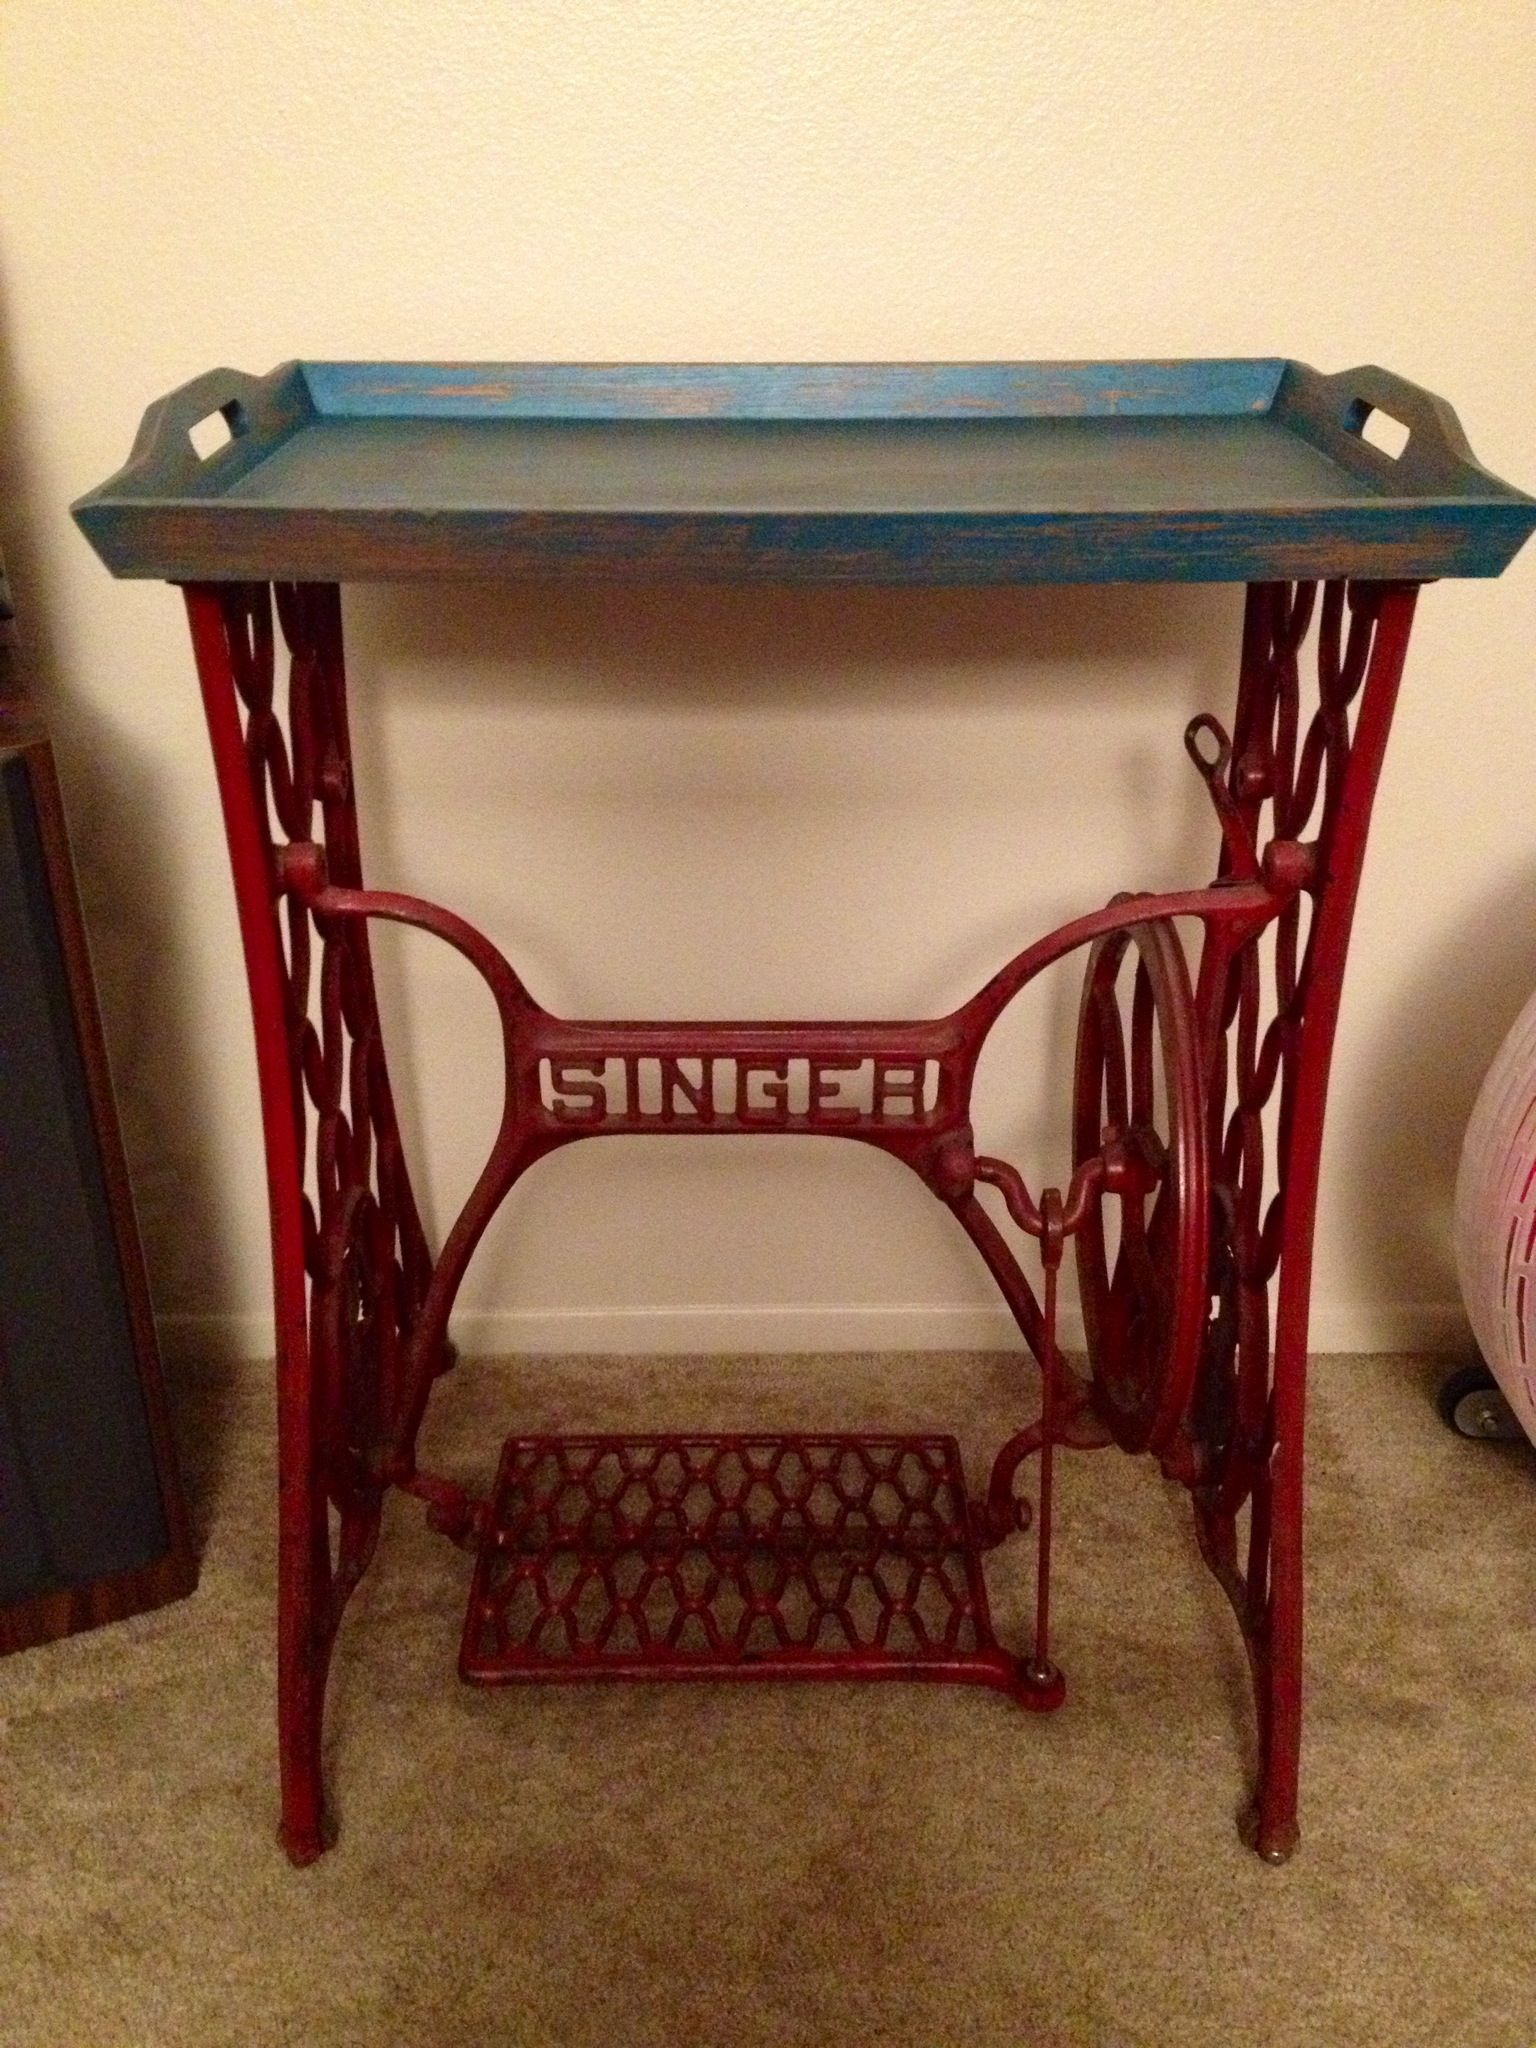 Admirable Vintage End Table Antique Sewing Machine Base Plus Serving Interior Design Ideas Oteneahmetsinanyavuzinfo